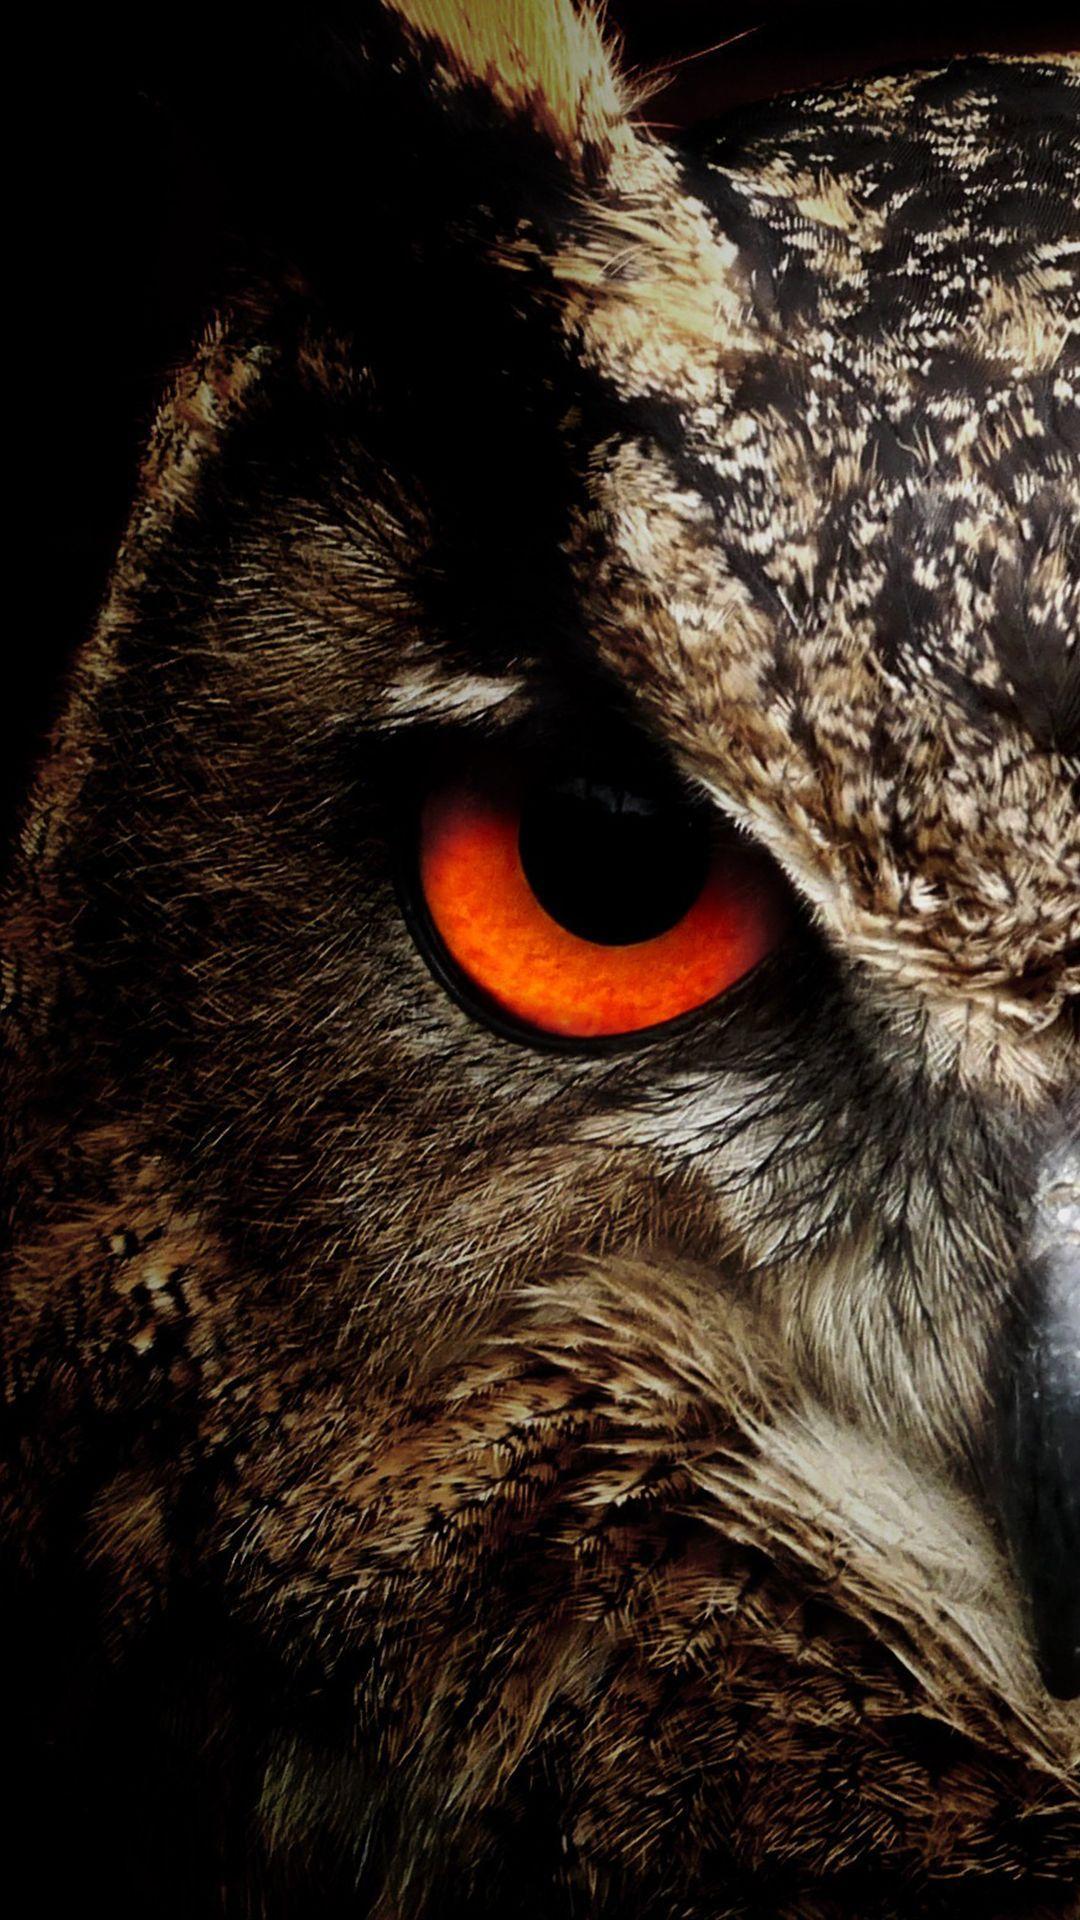 Unduh 300 Wallpaper Android Owl HD Paling Keren